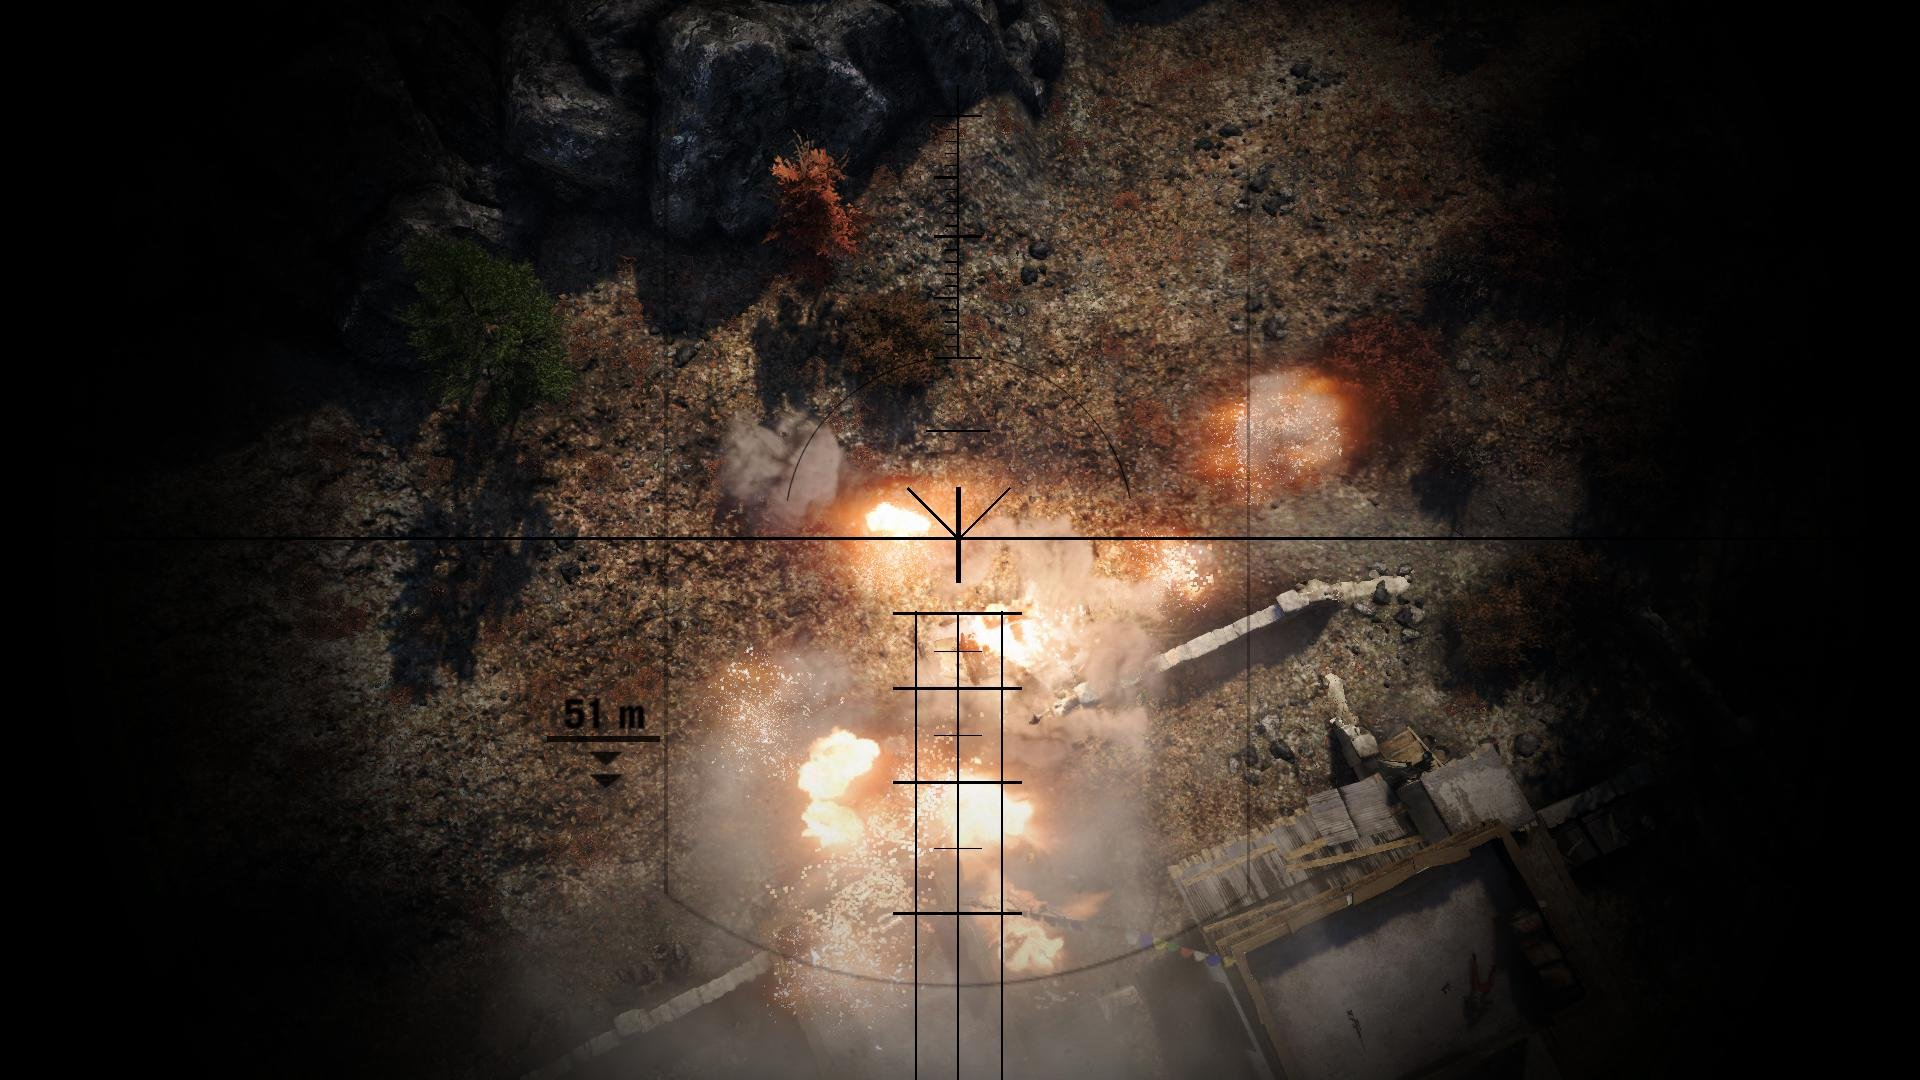 Far  Cry 4 - Page 2 798e76cc-f44a-443d-9d9c-d74c818b5b85